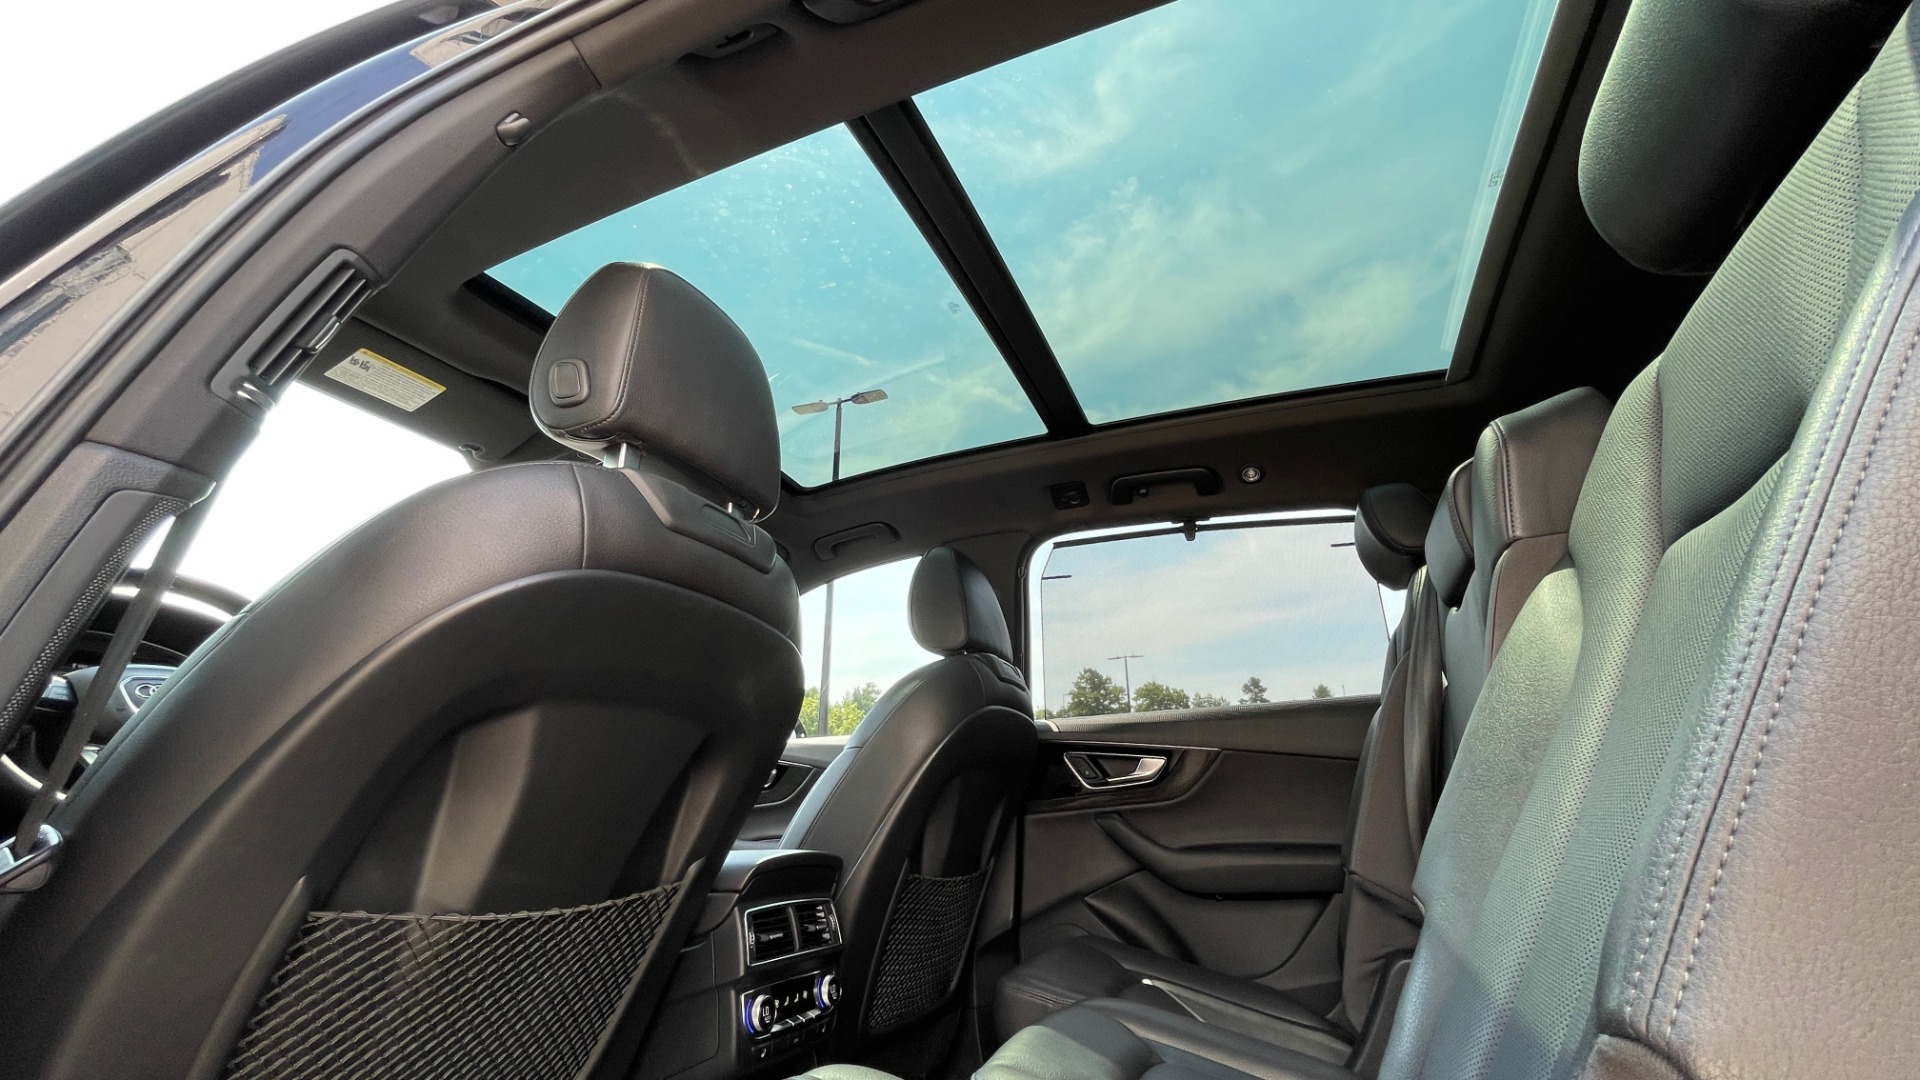 Used 2018 Audi Q7 PRESTIGE TIPTRONIC / NAV / SUNROOF / ADAPTIVE PKG / DRVR ASST / CLD WTHR /  for sale $49,995 at Formula Imports in Charlotte NC 28227 61